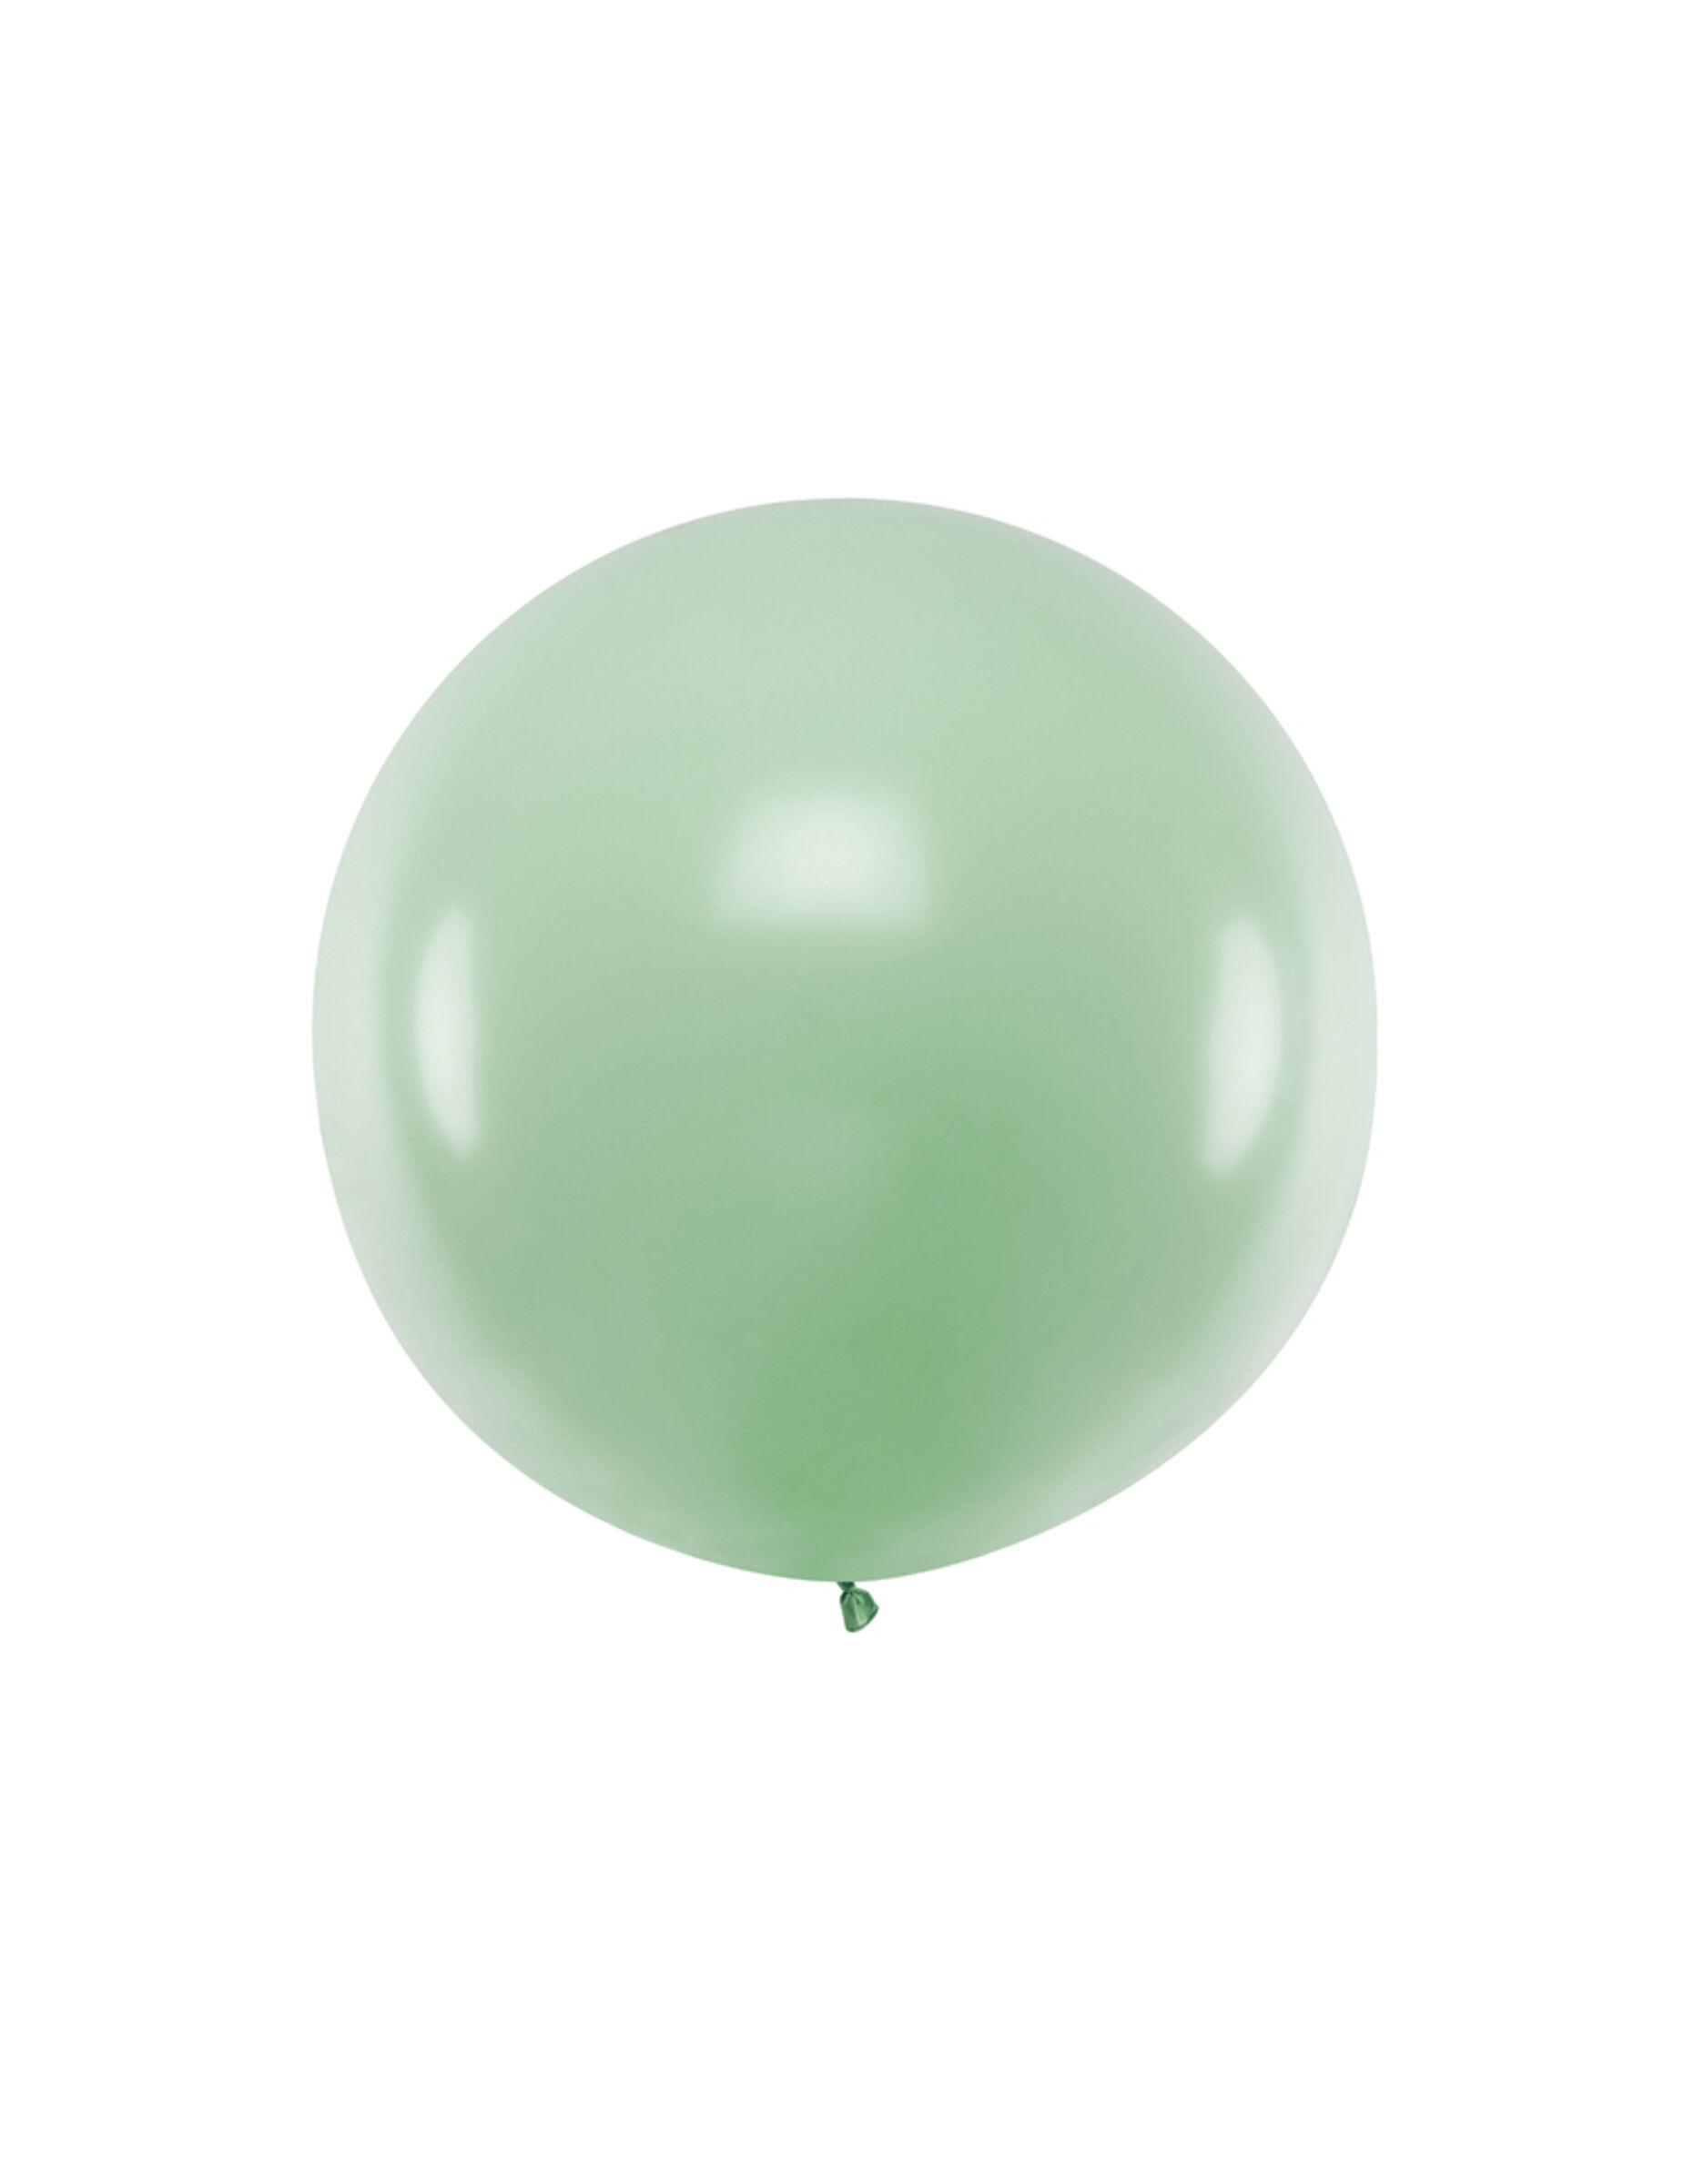 VegaooParty Ballon en latex géant pistache 1 m